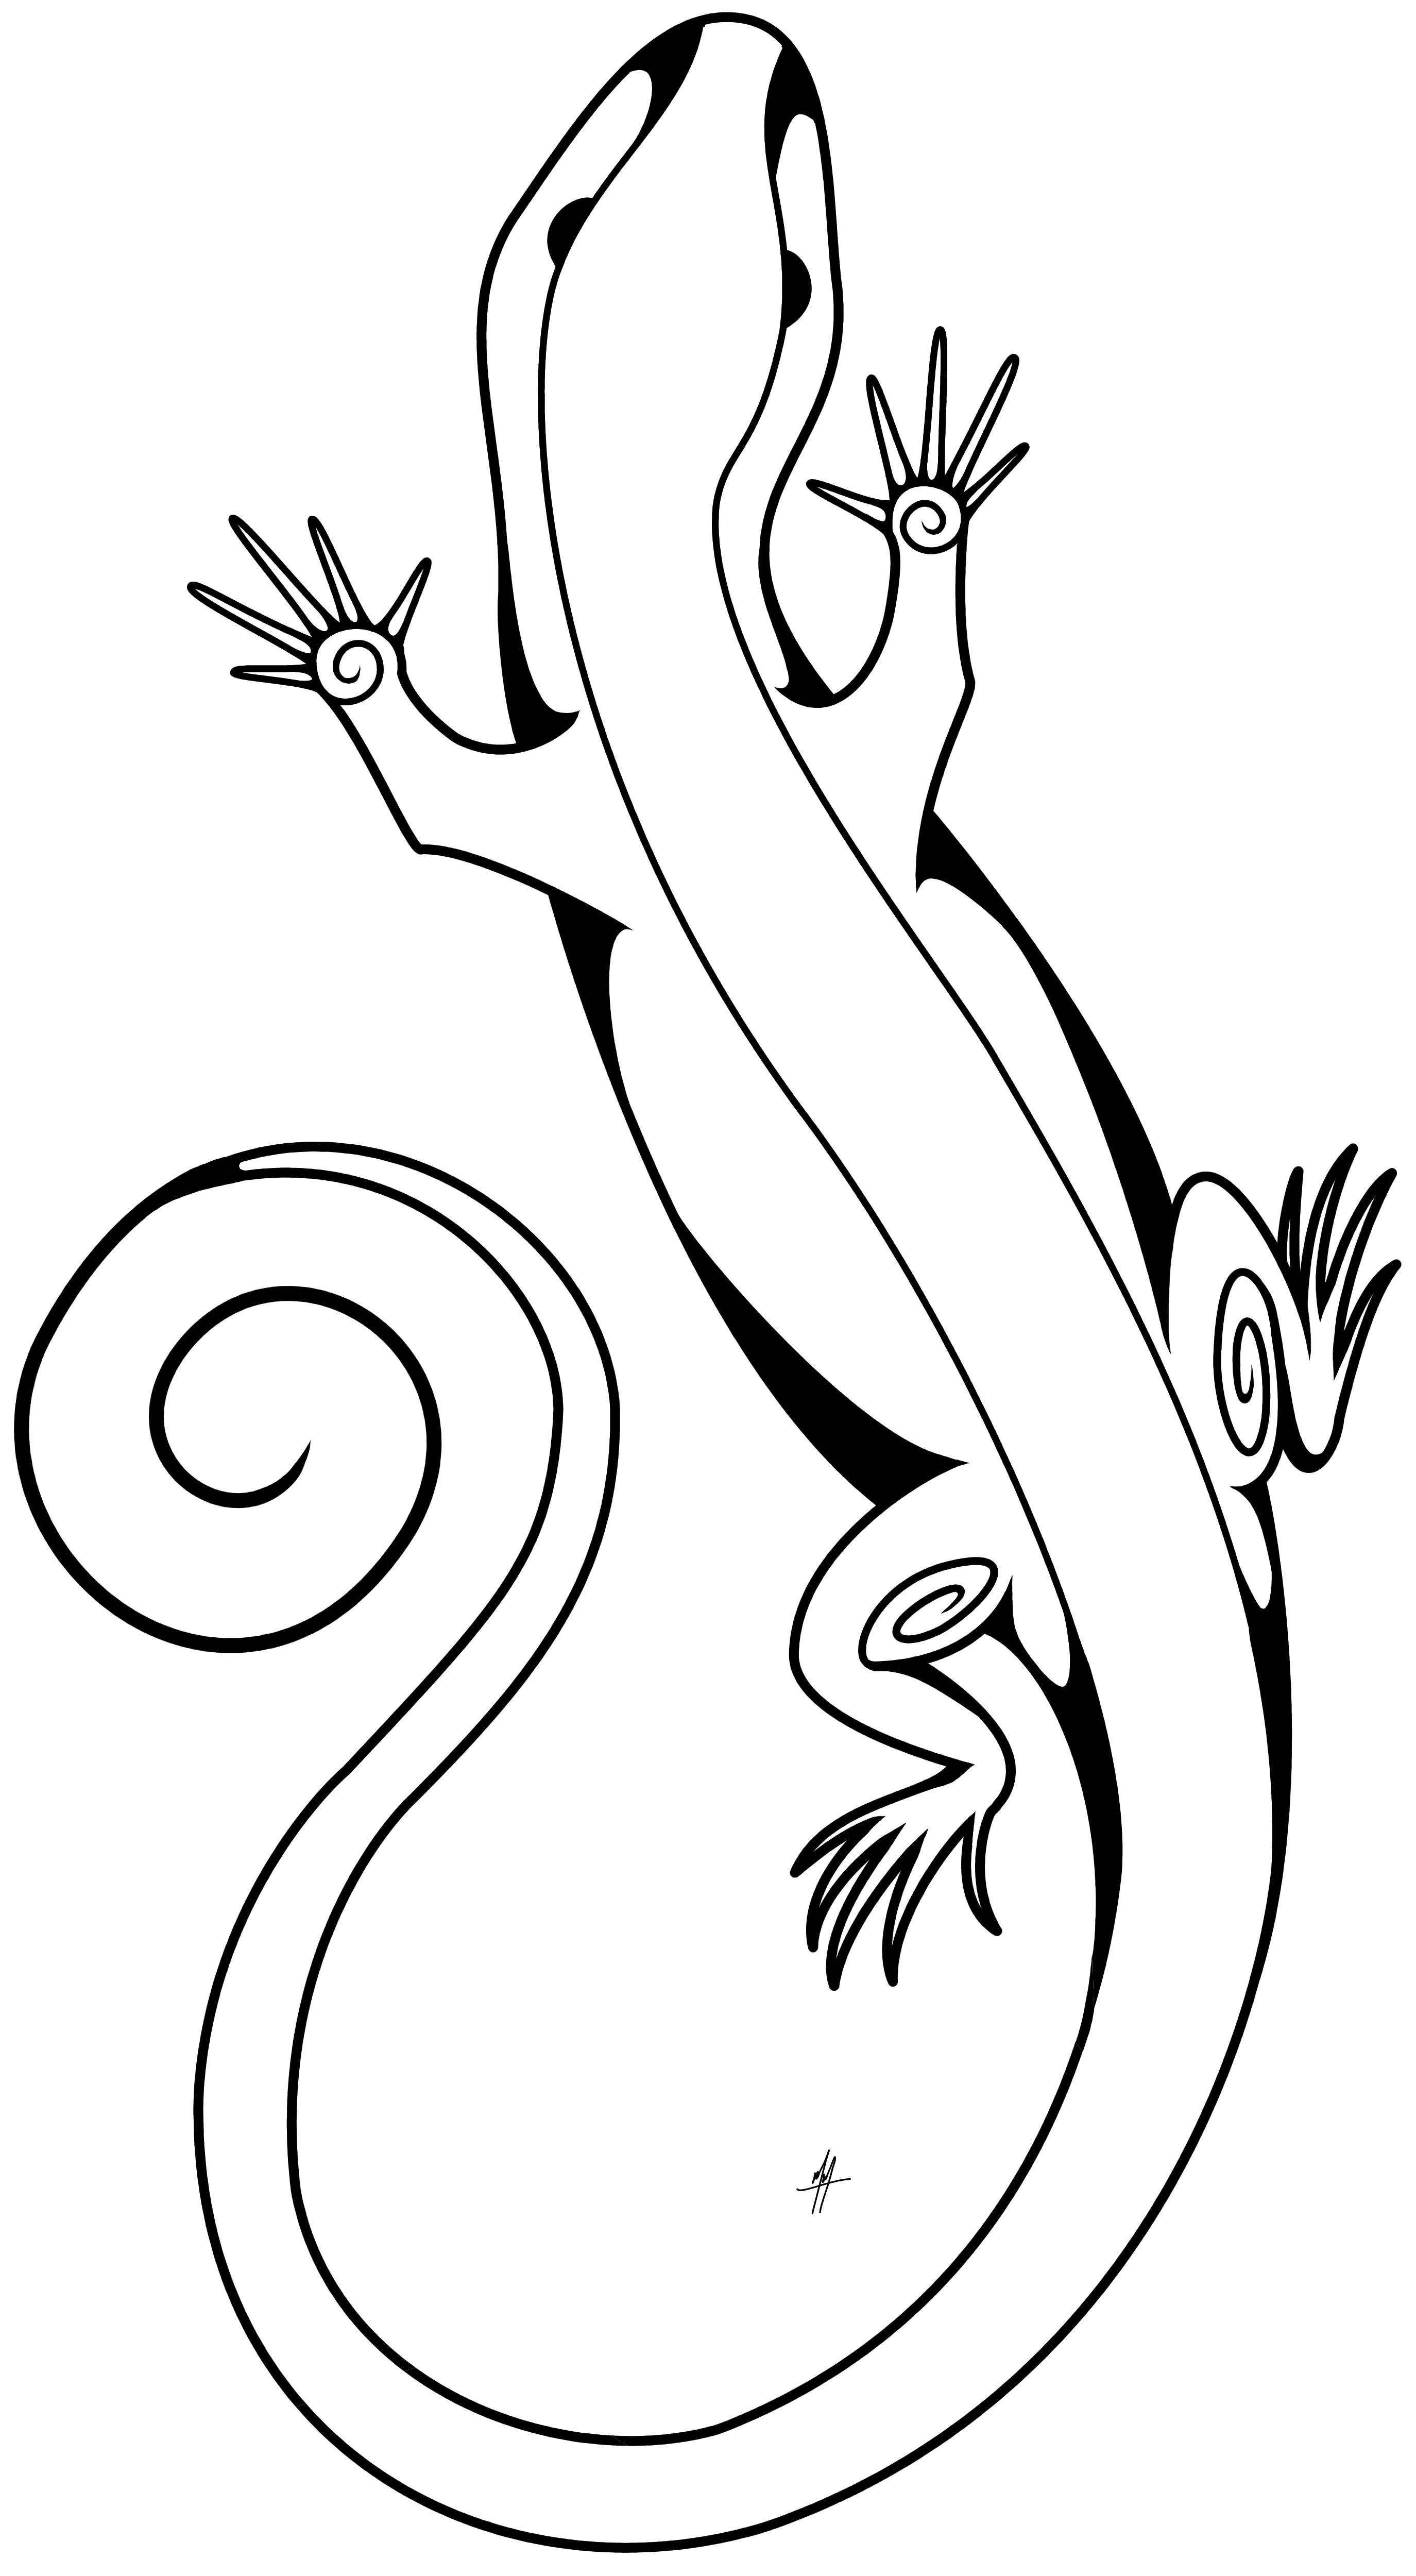 2749x5000 Reptile Masonillustration School Projects